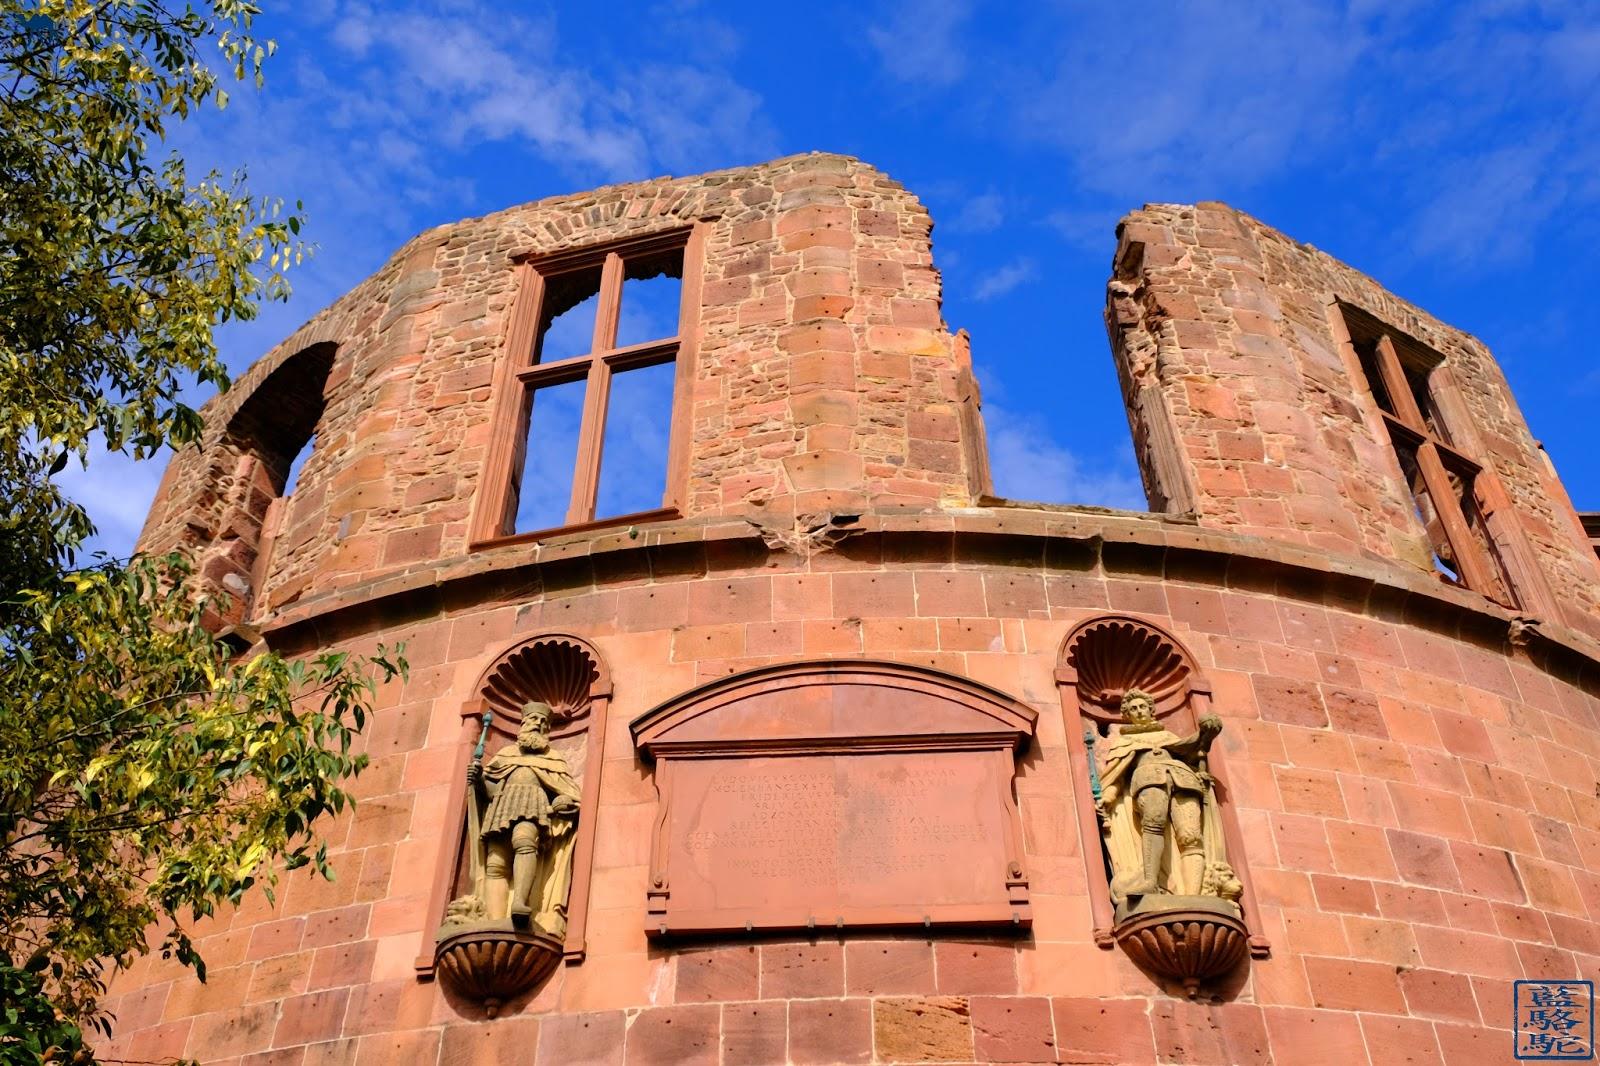 Le Chameau Bleu - Blog Voyage Heildeberg Allemagne - Chateau Heidelberg - statue